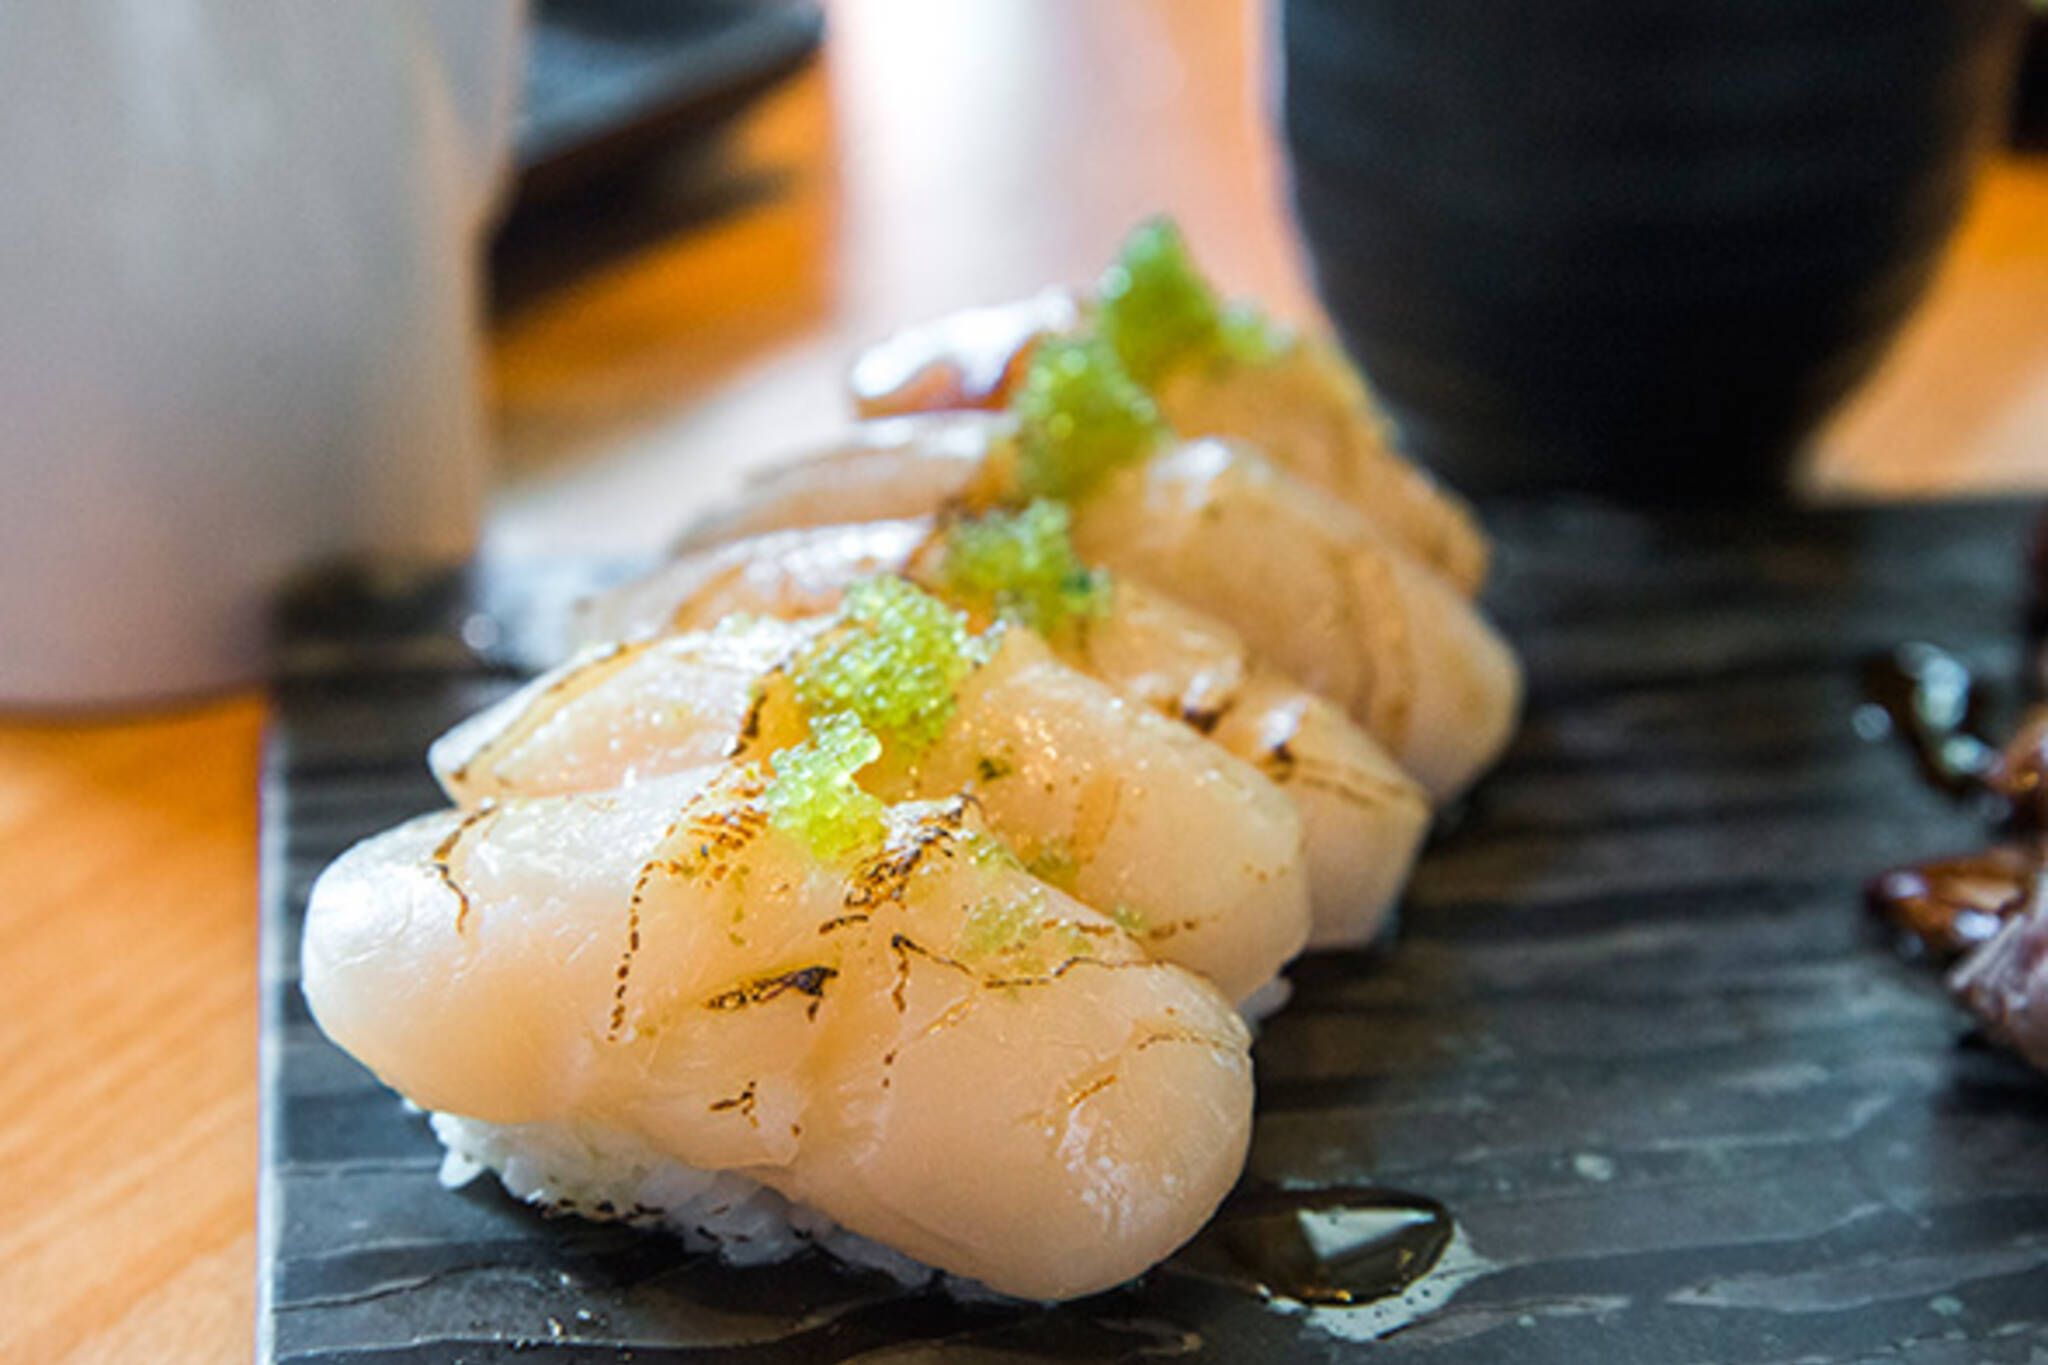 kaka all you can eat sushi